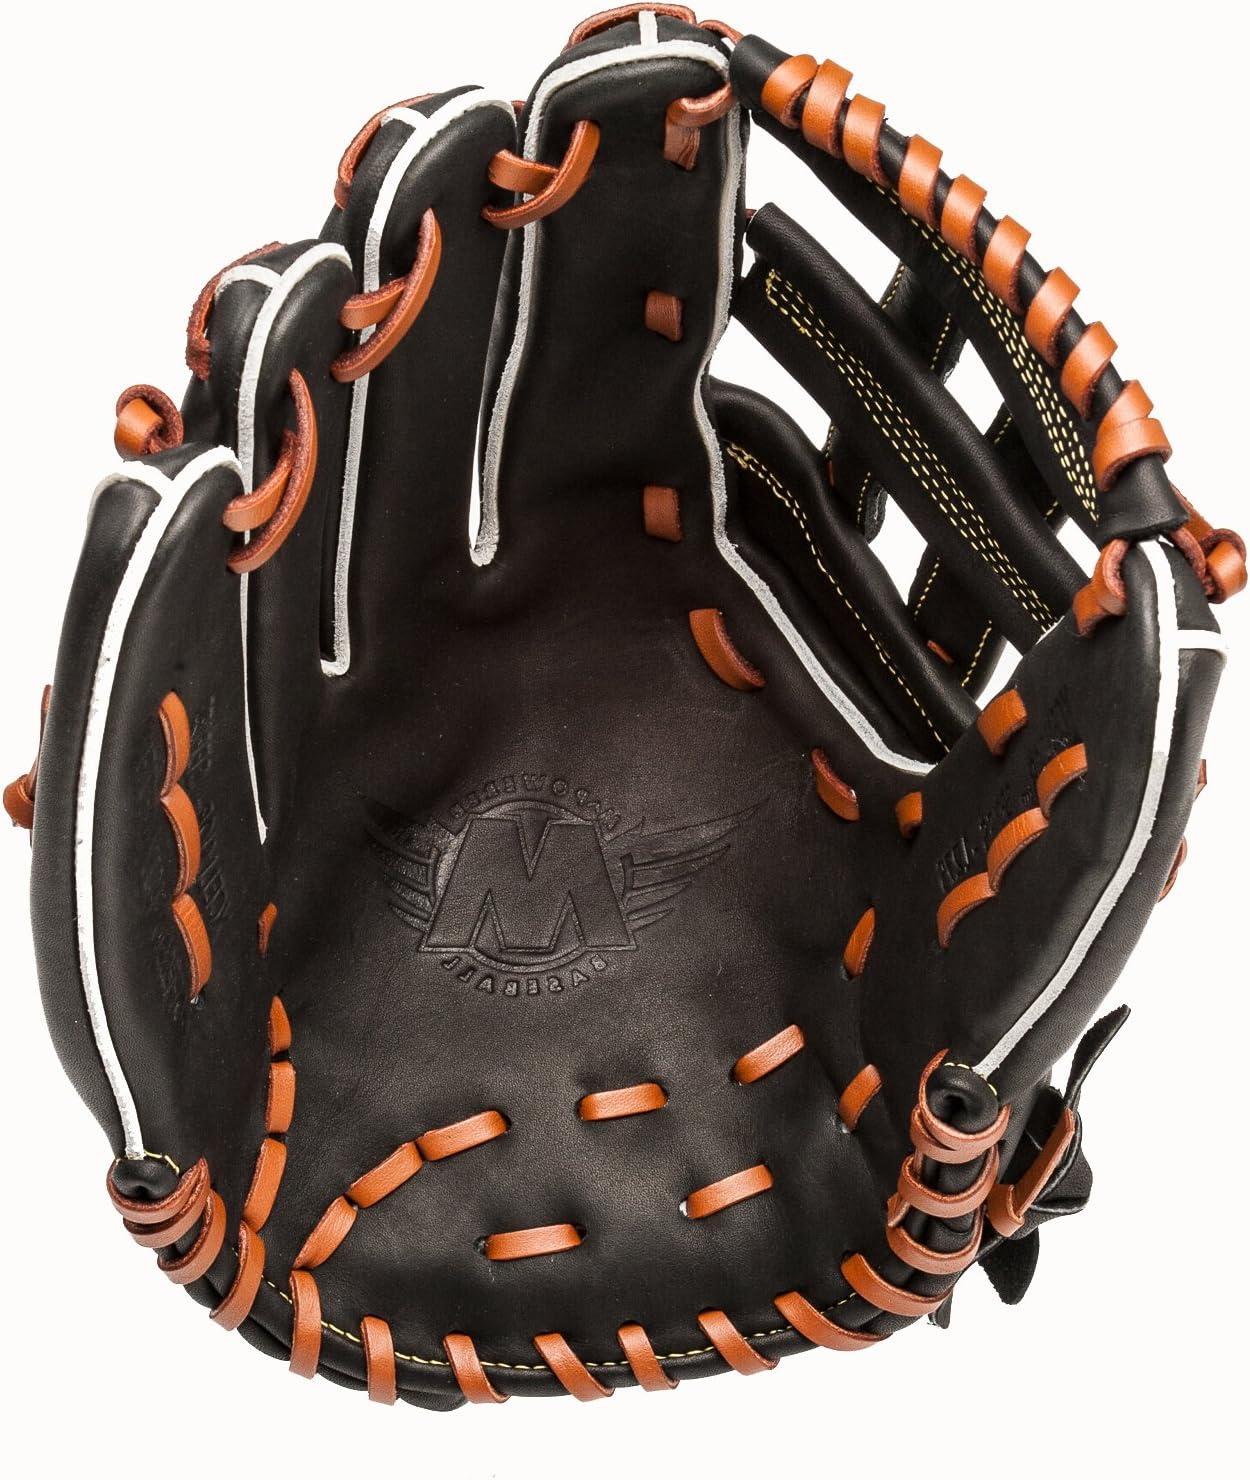 Mpowe赤野球Xcellsiorシリーズ12.75-inch h-web Outfielder 's野球グローブ ブラック